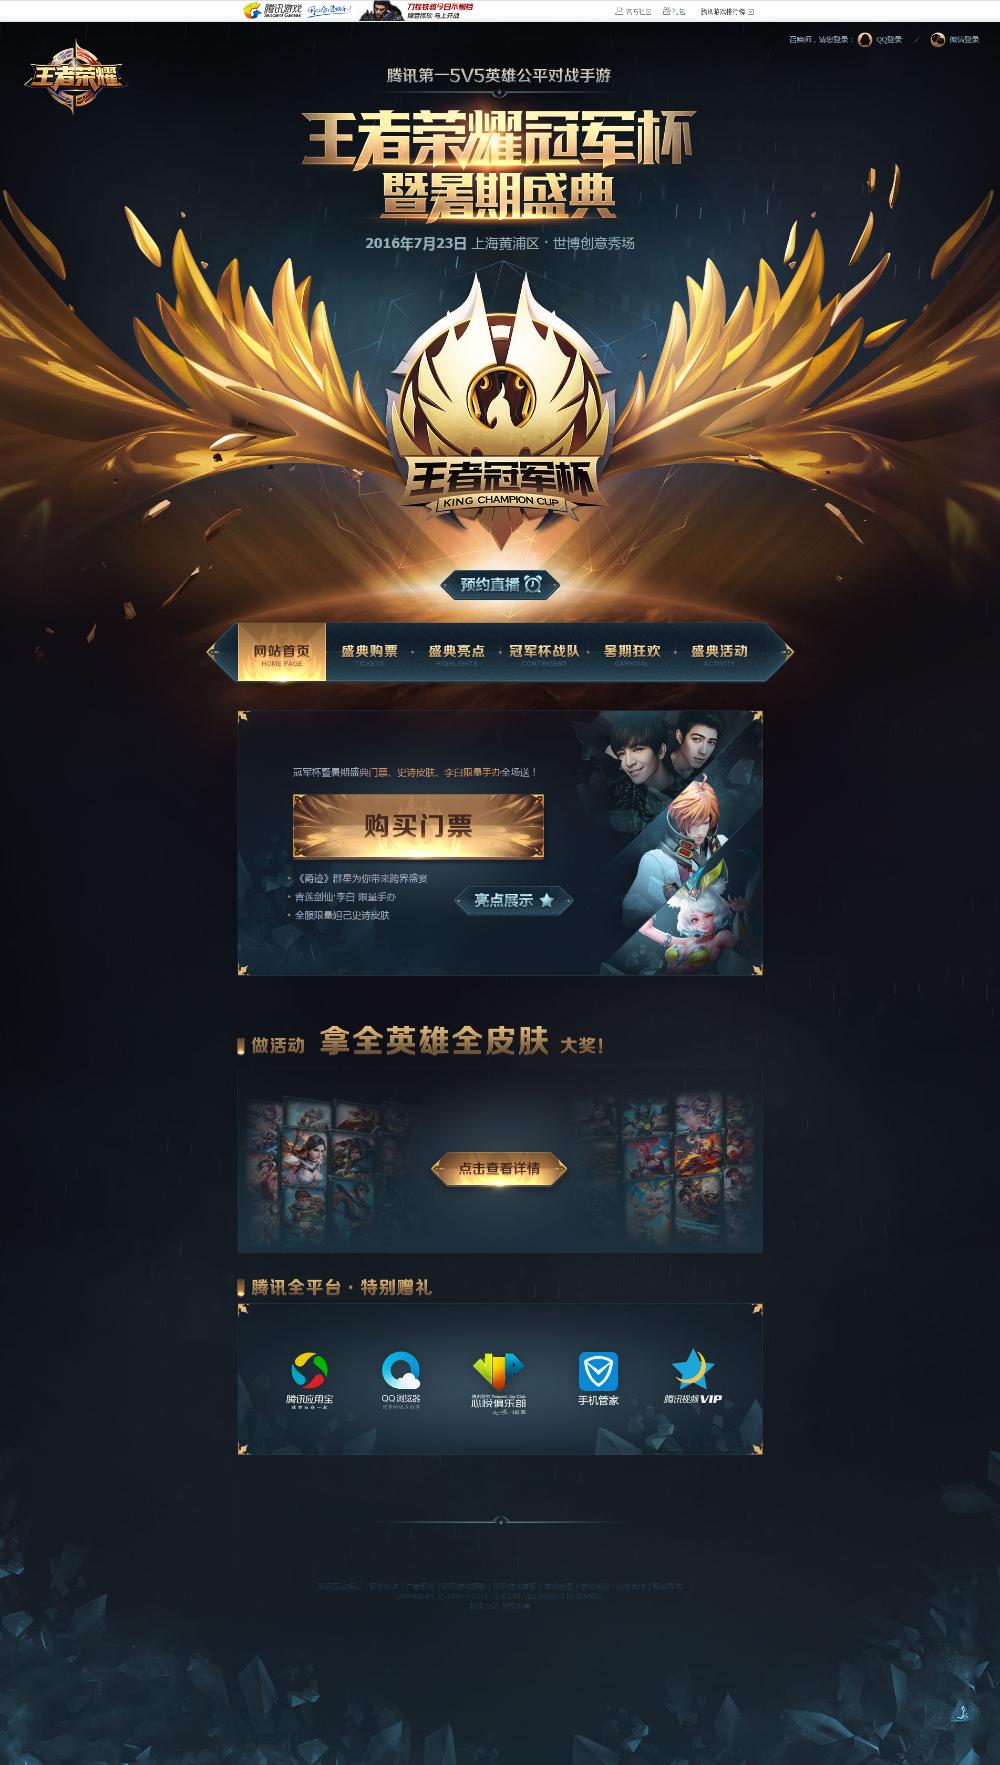 Pin by 新策 侯 on 游戏 Web layout design, Web design